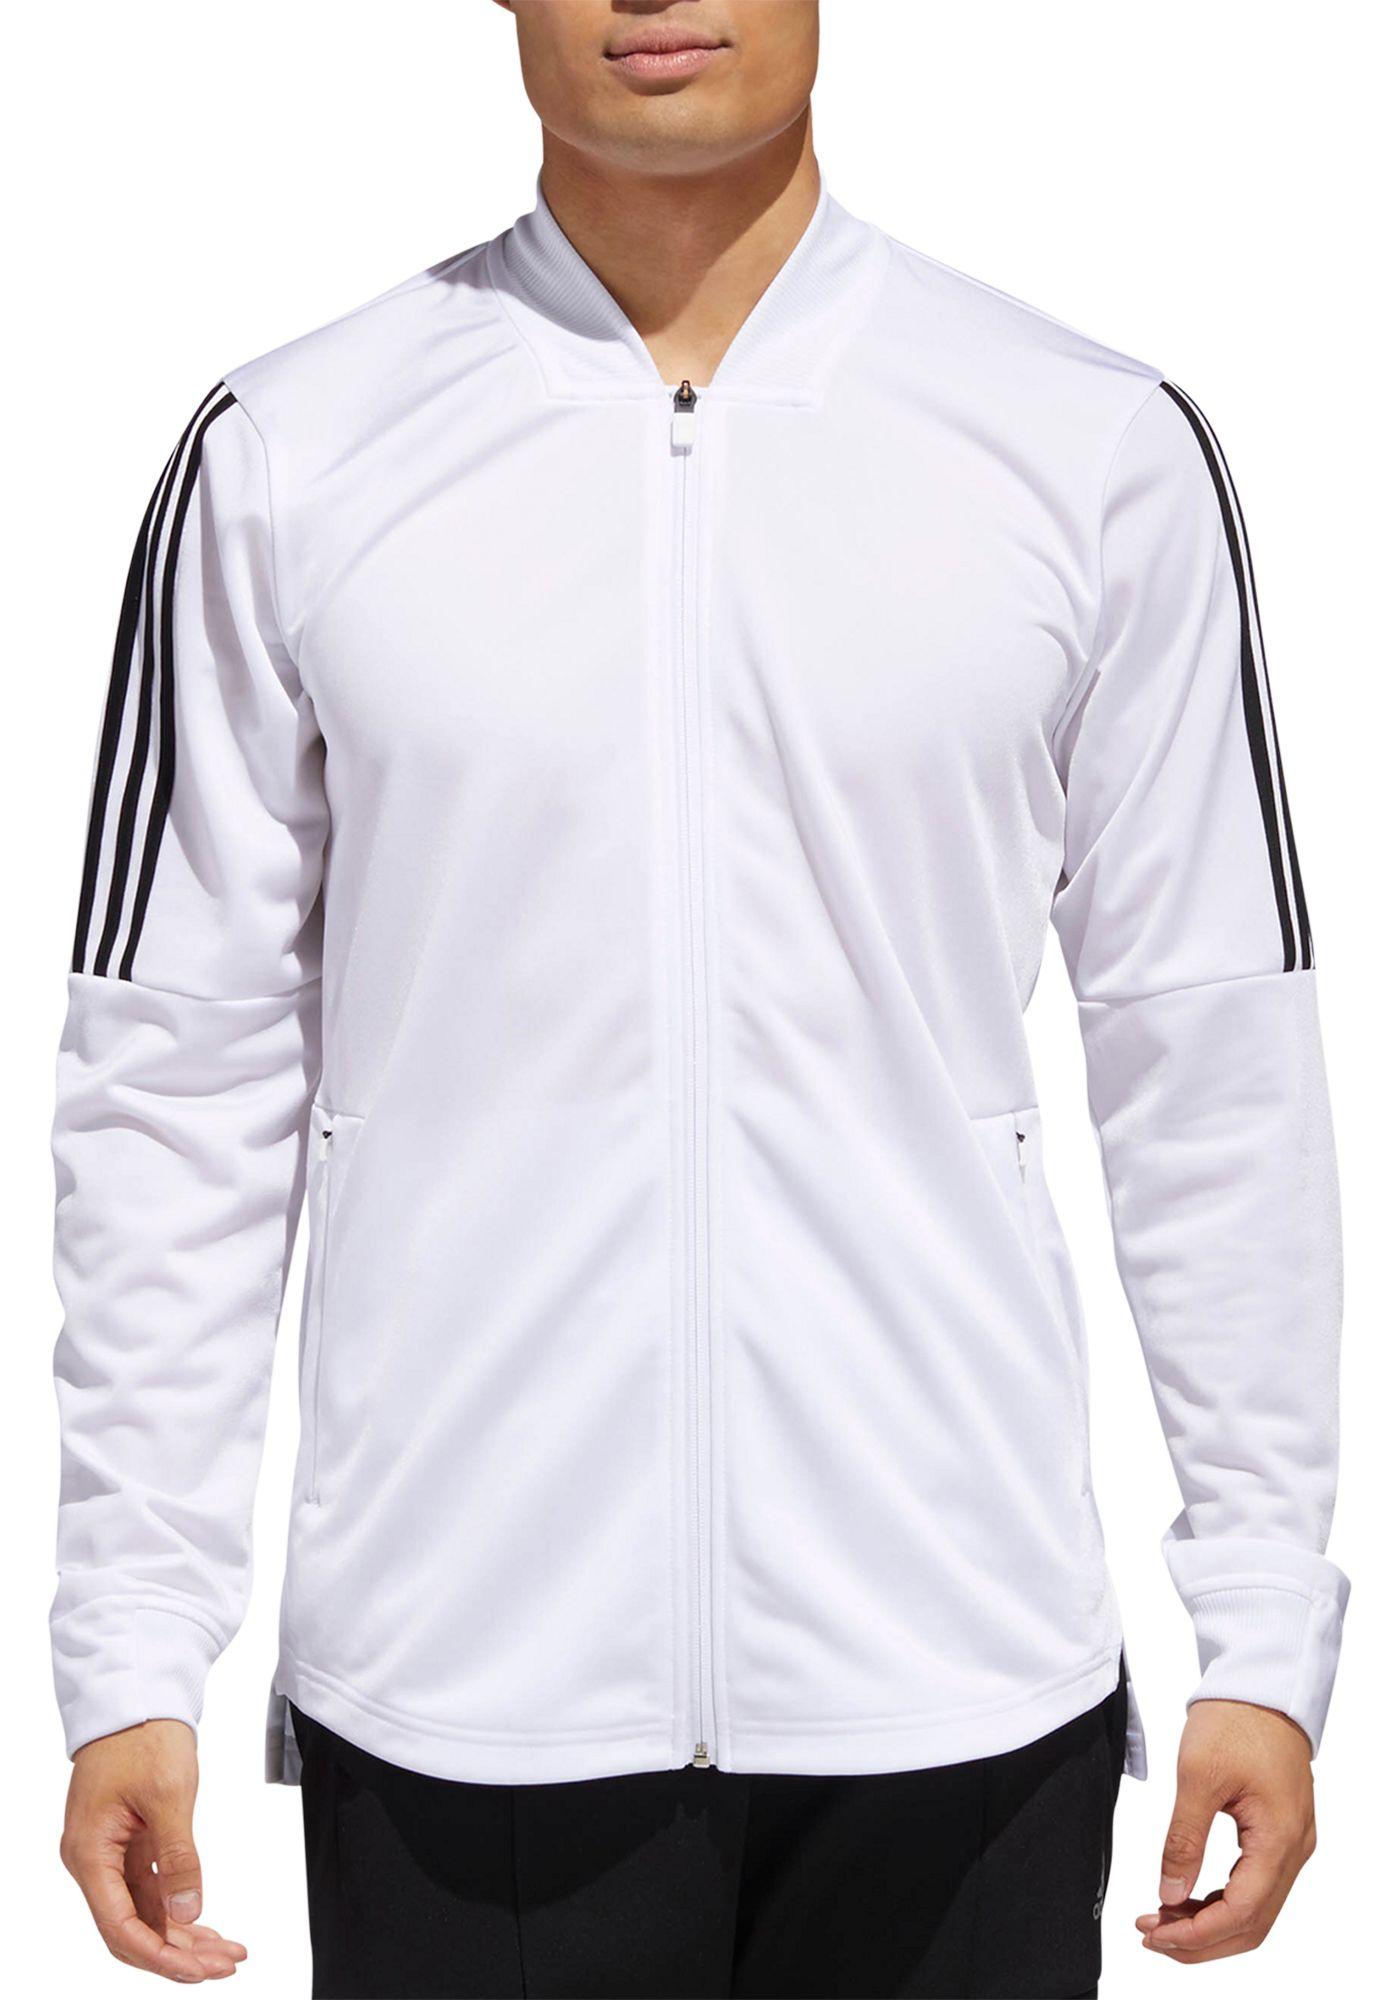 adidas Men's ID Bomber Jacket